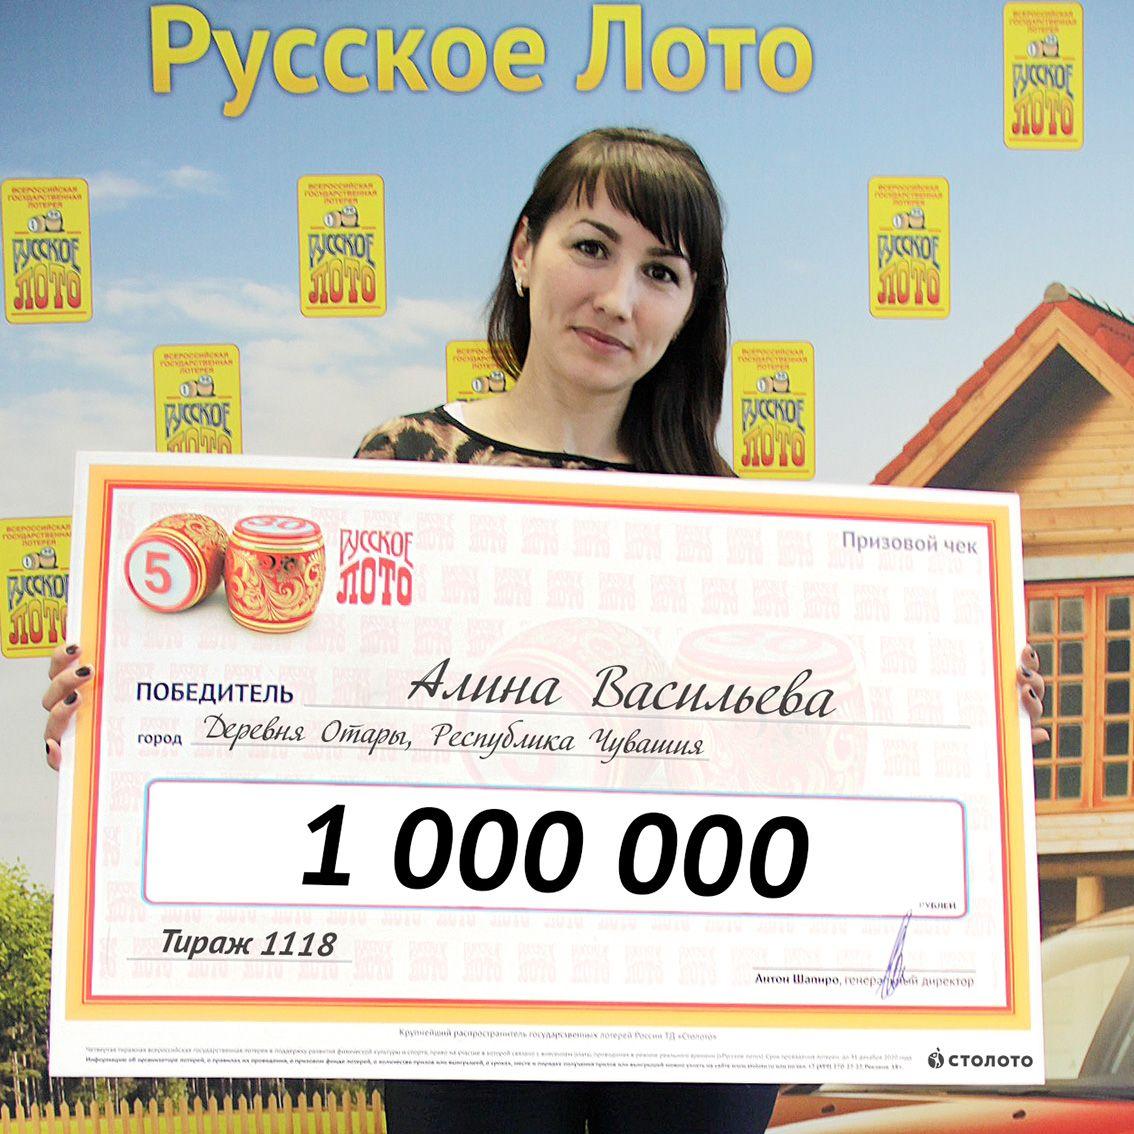 русское лото джекпот 1118